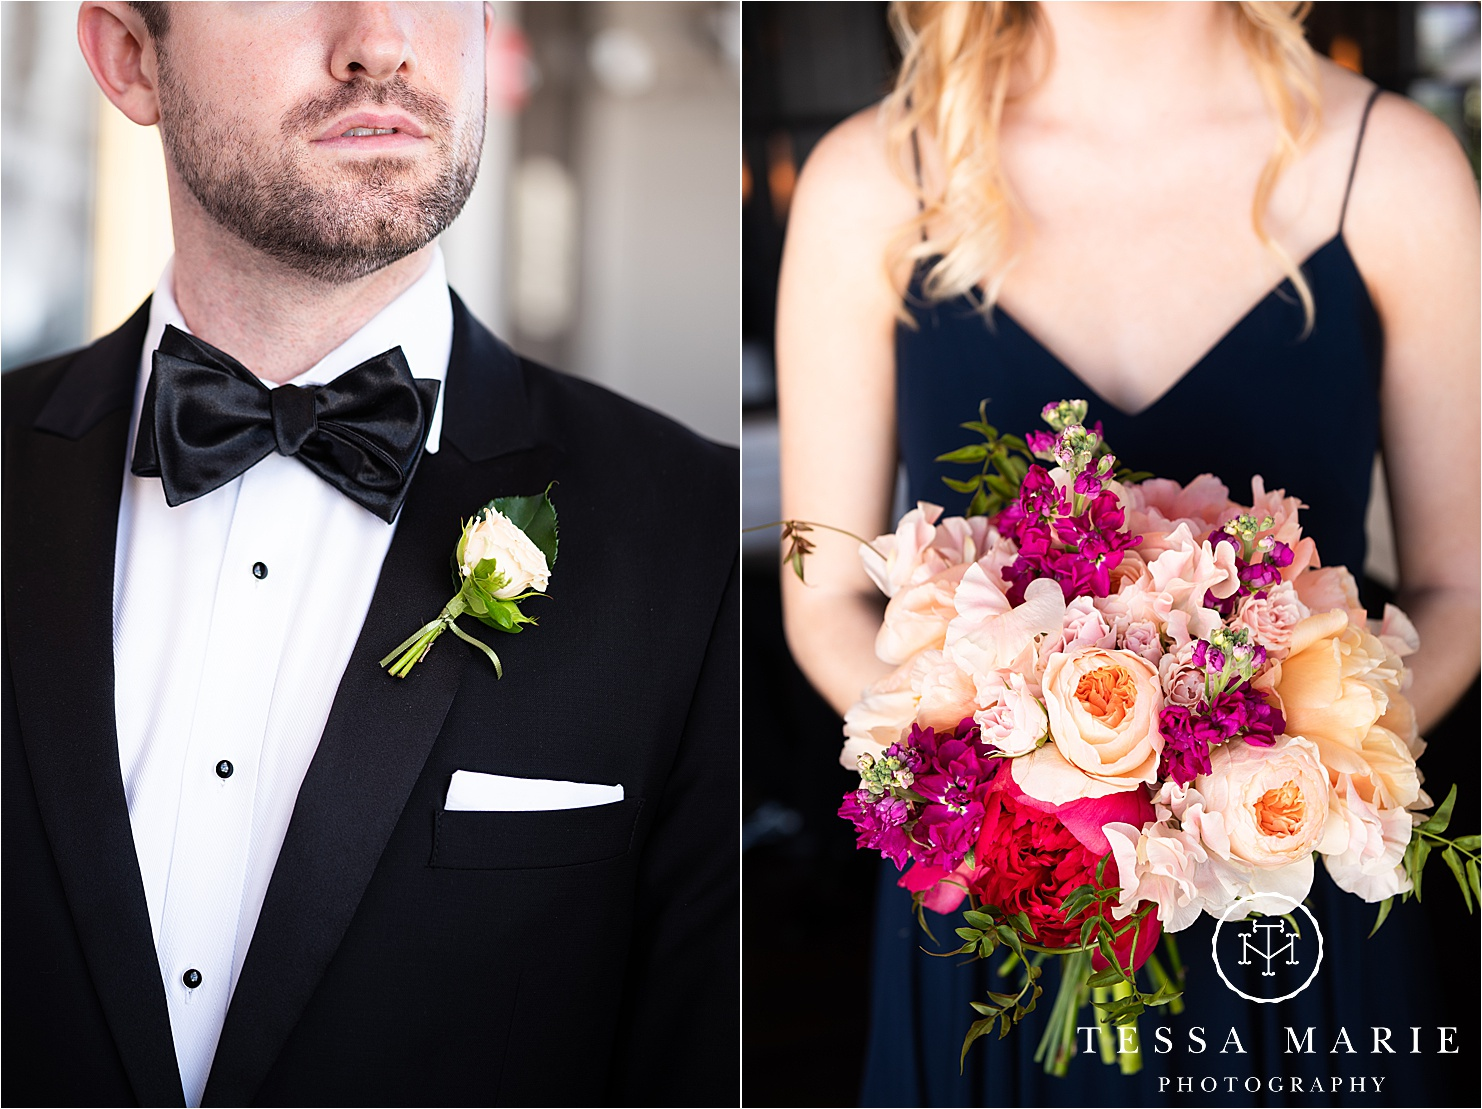 Tessa_marie_weddings_houston_wedding_photographer_The_astorian_0090.jpg